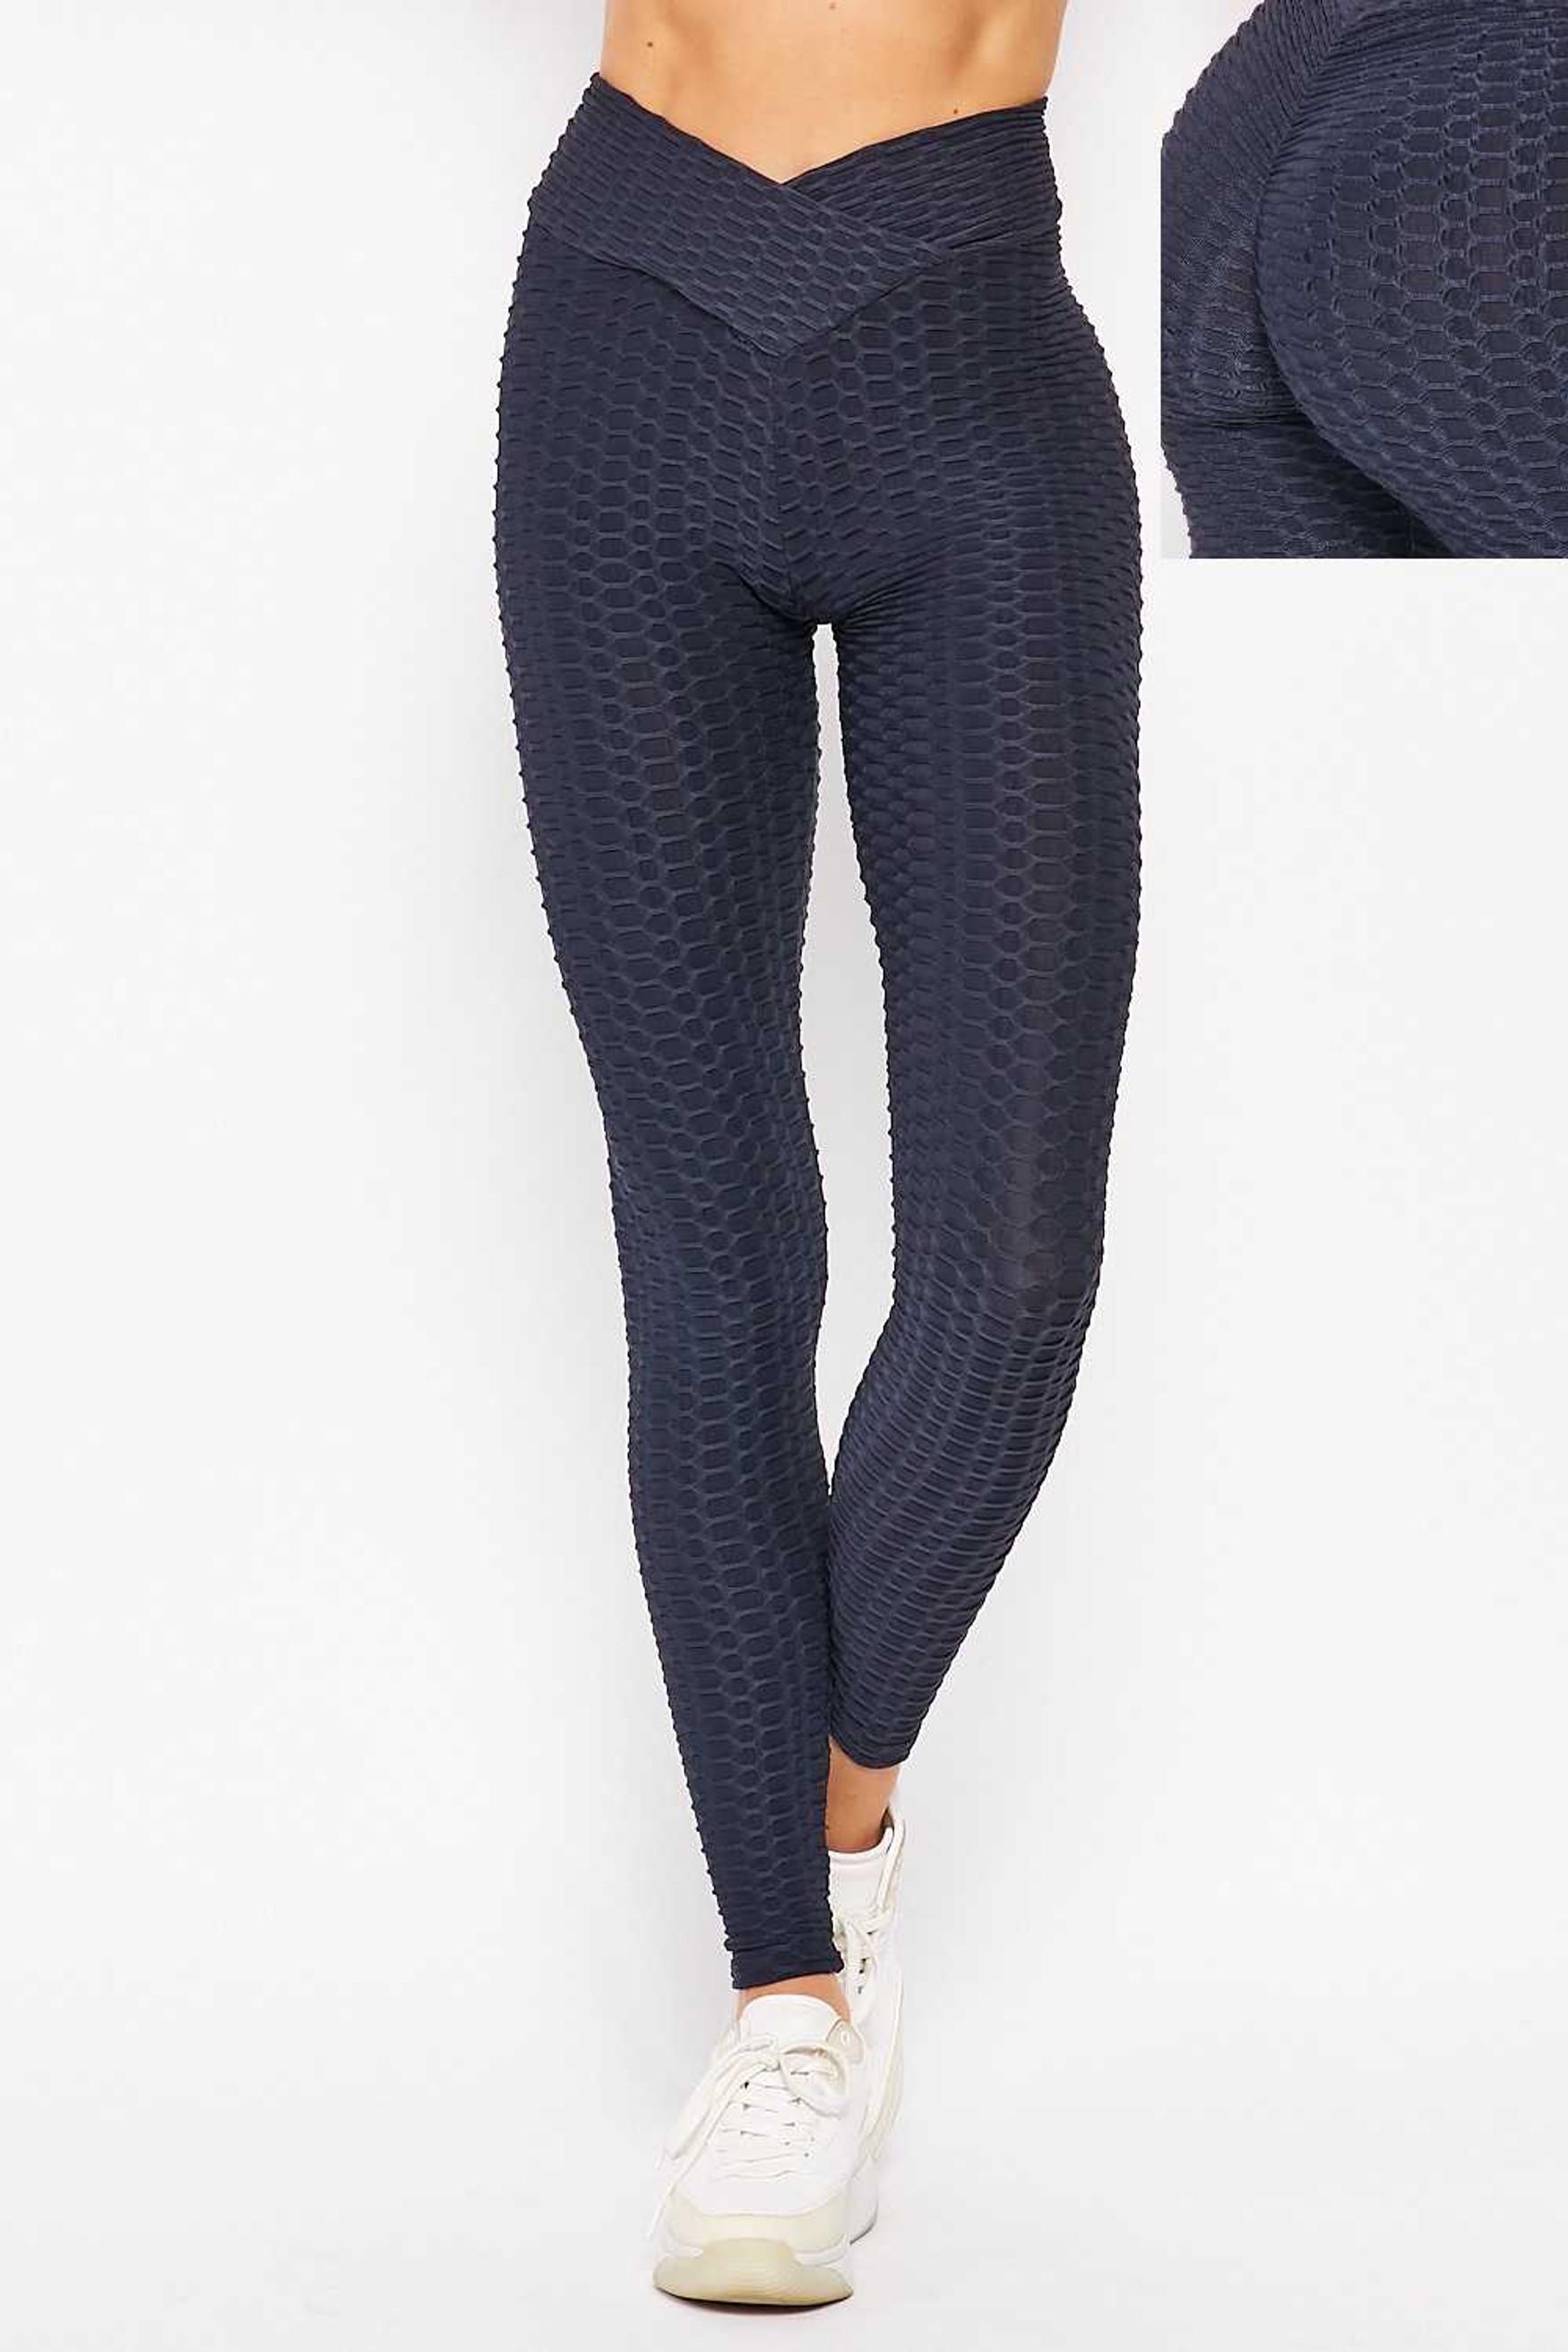 Scrunch Butt Textured V-Waist High Waisted Plus Size Leggings with Pockets